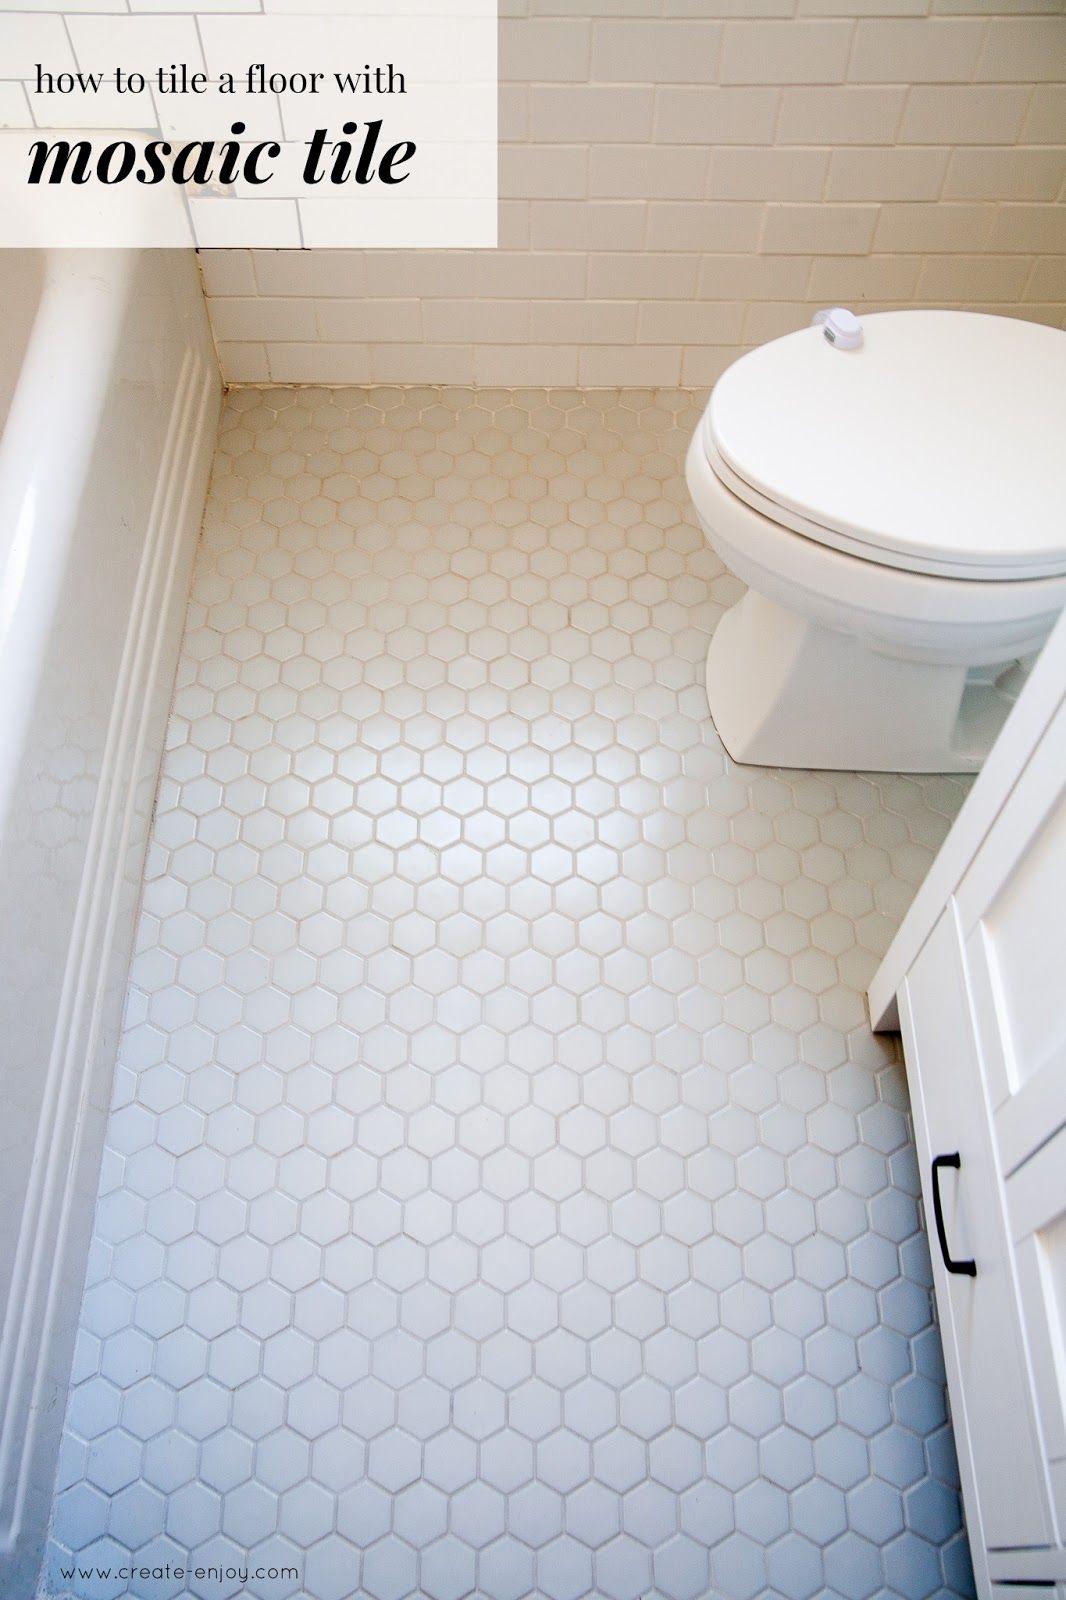 How To Lay Mosaic Tile Flooring Week 2 One Room Challenge Bathroom Reno With Hexagon Floor Hexagon Tile Bathroom Floor White Hexagon Tile Bathroom Mosaic Bathroom Tile